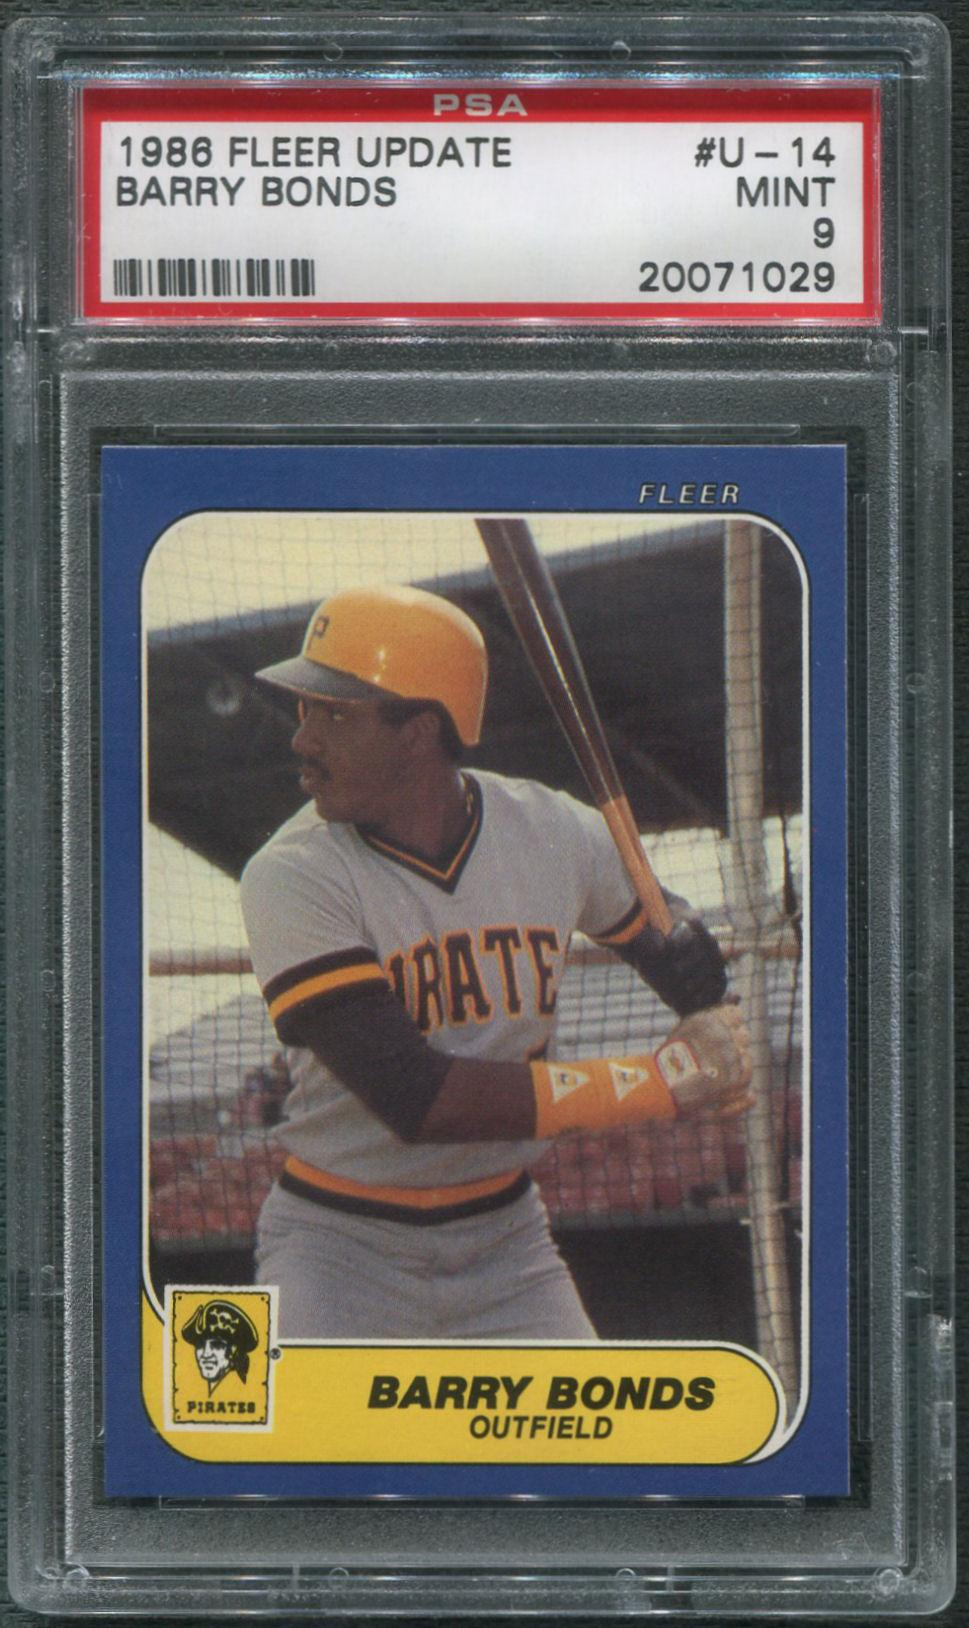 Update 14 Year Old Missing From Denham Springs Area Found: 1986 Fleer Update Baseball #U-14 Barry Bonds Rookie PSA 9